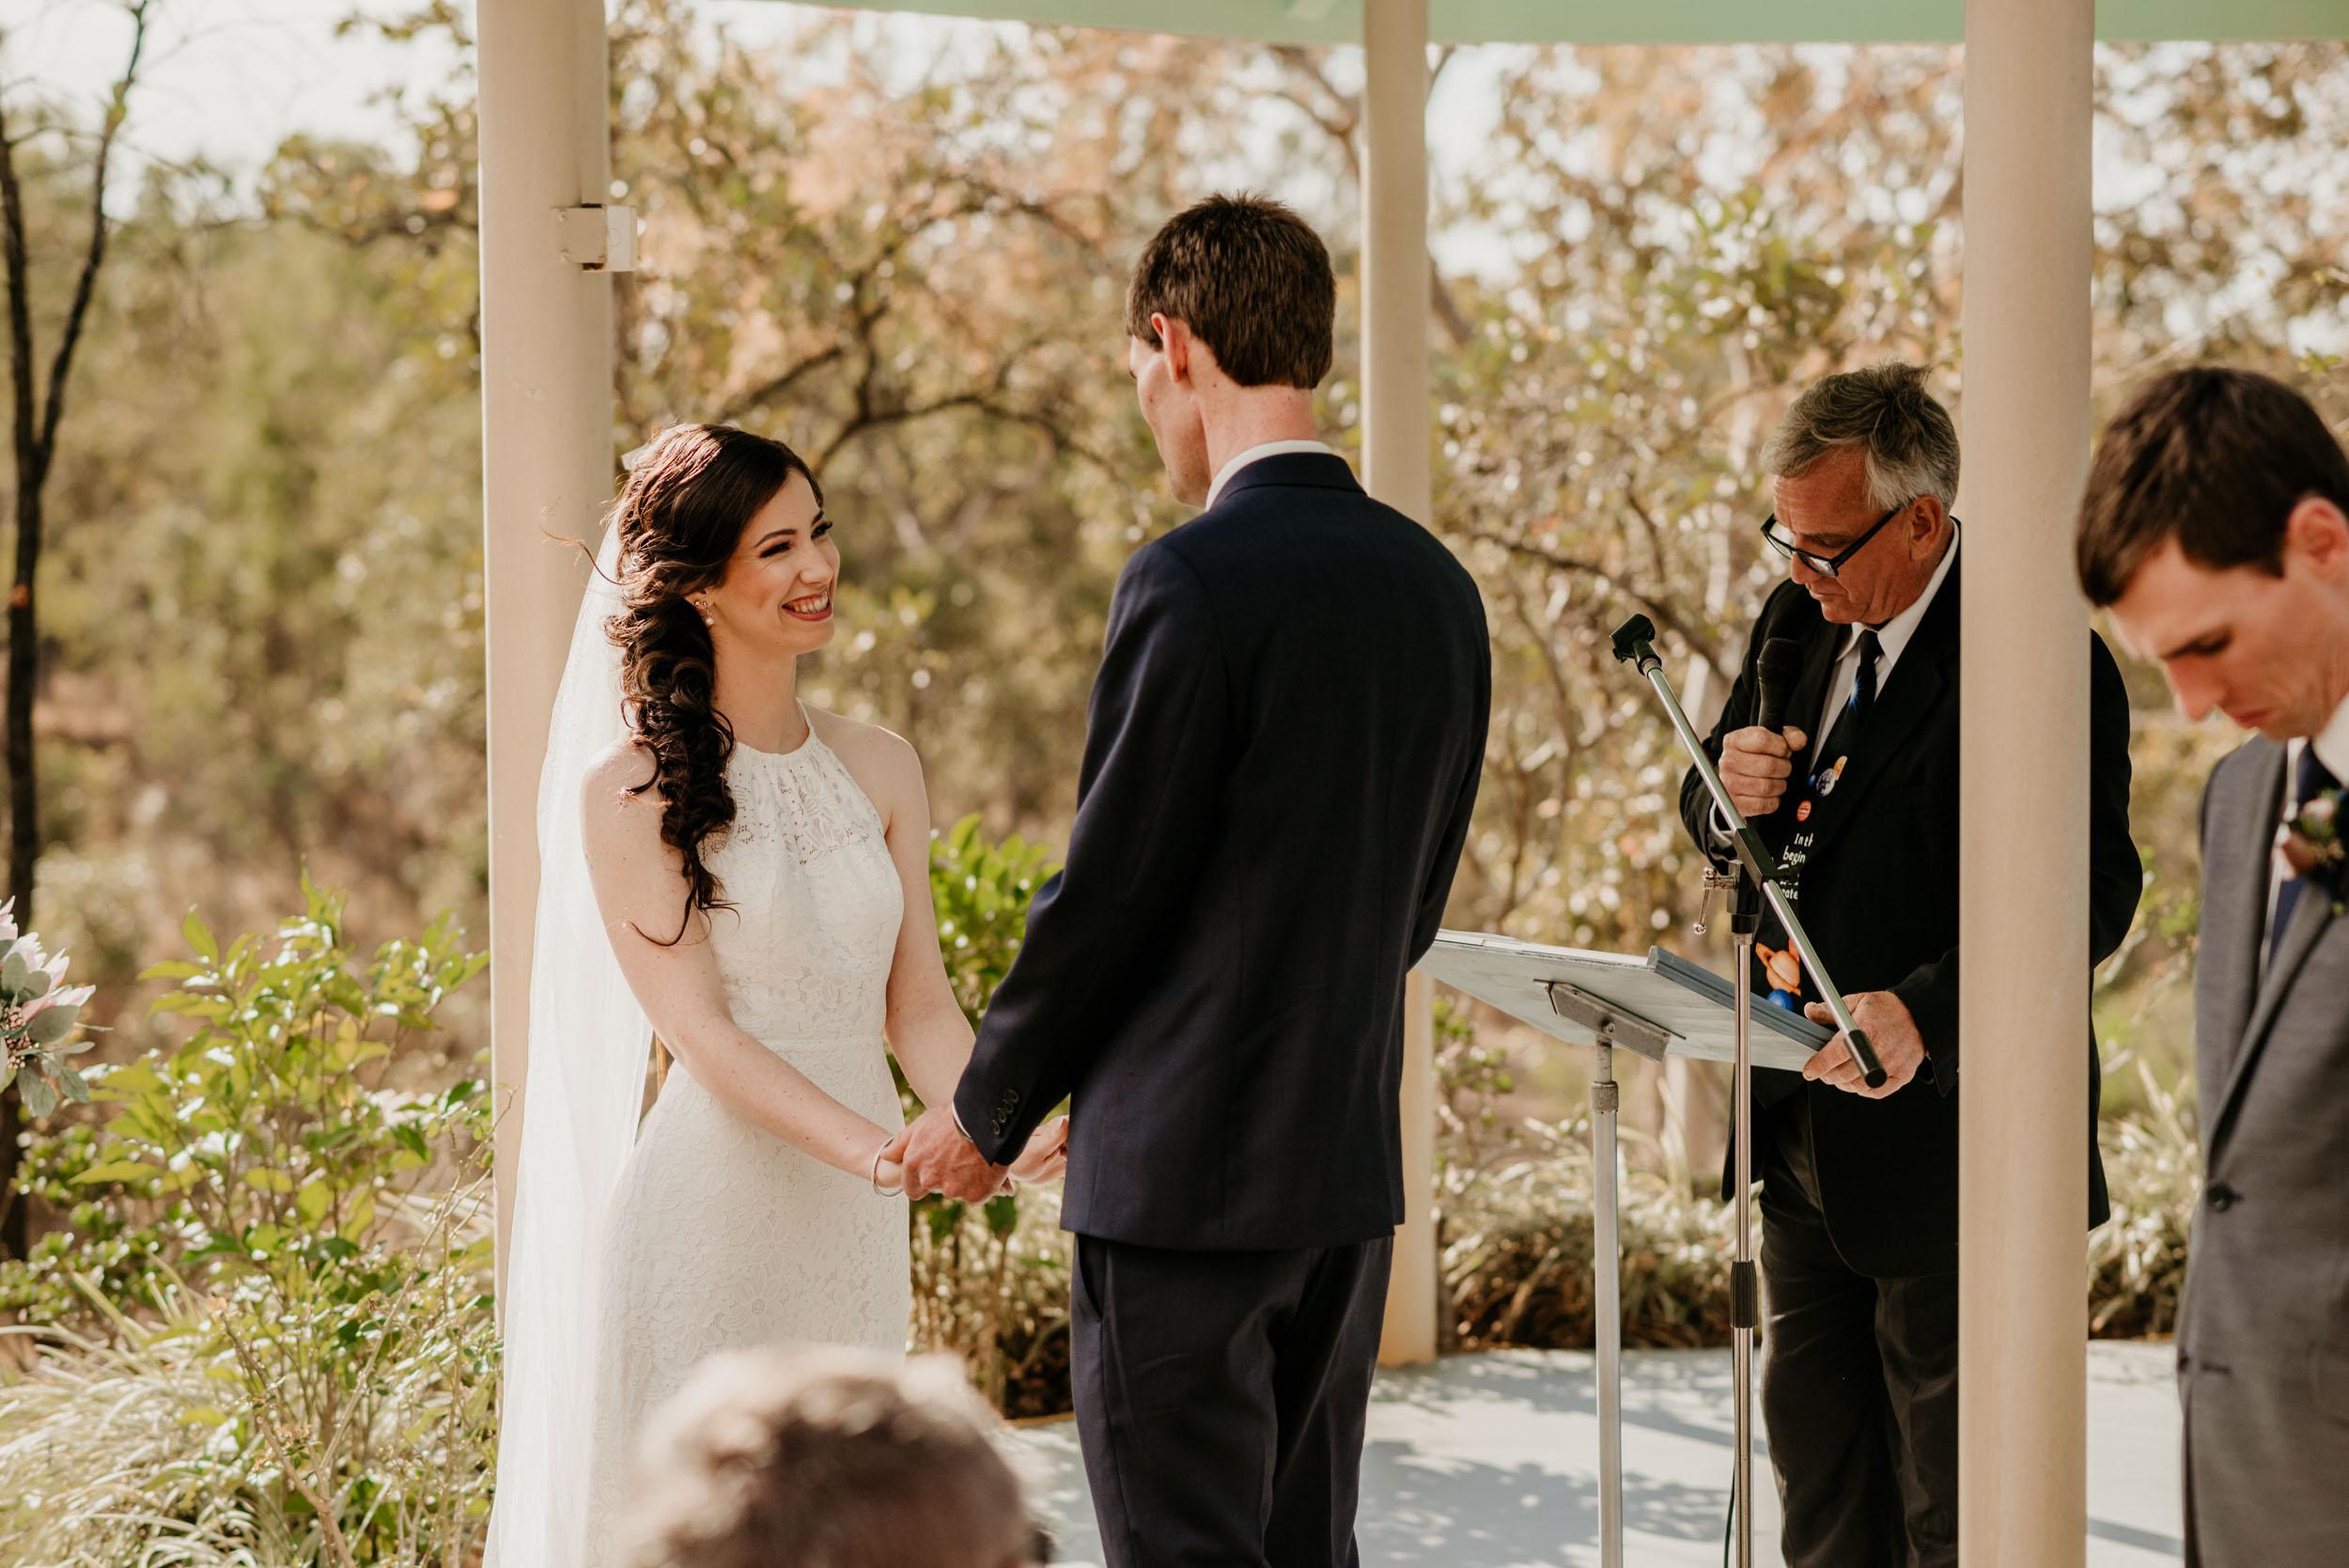 The Raw Photographer - Cairns Wedding Photographer - Atherton Tablelands Venue - Mareeba Photography-31.jpg